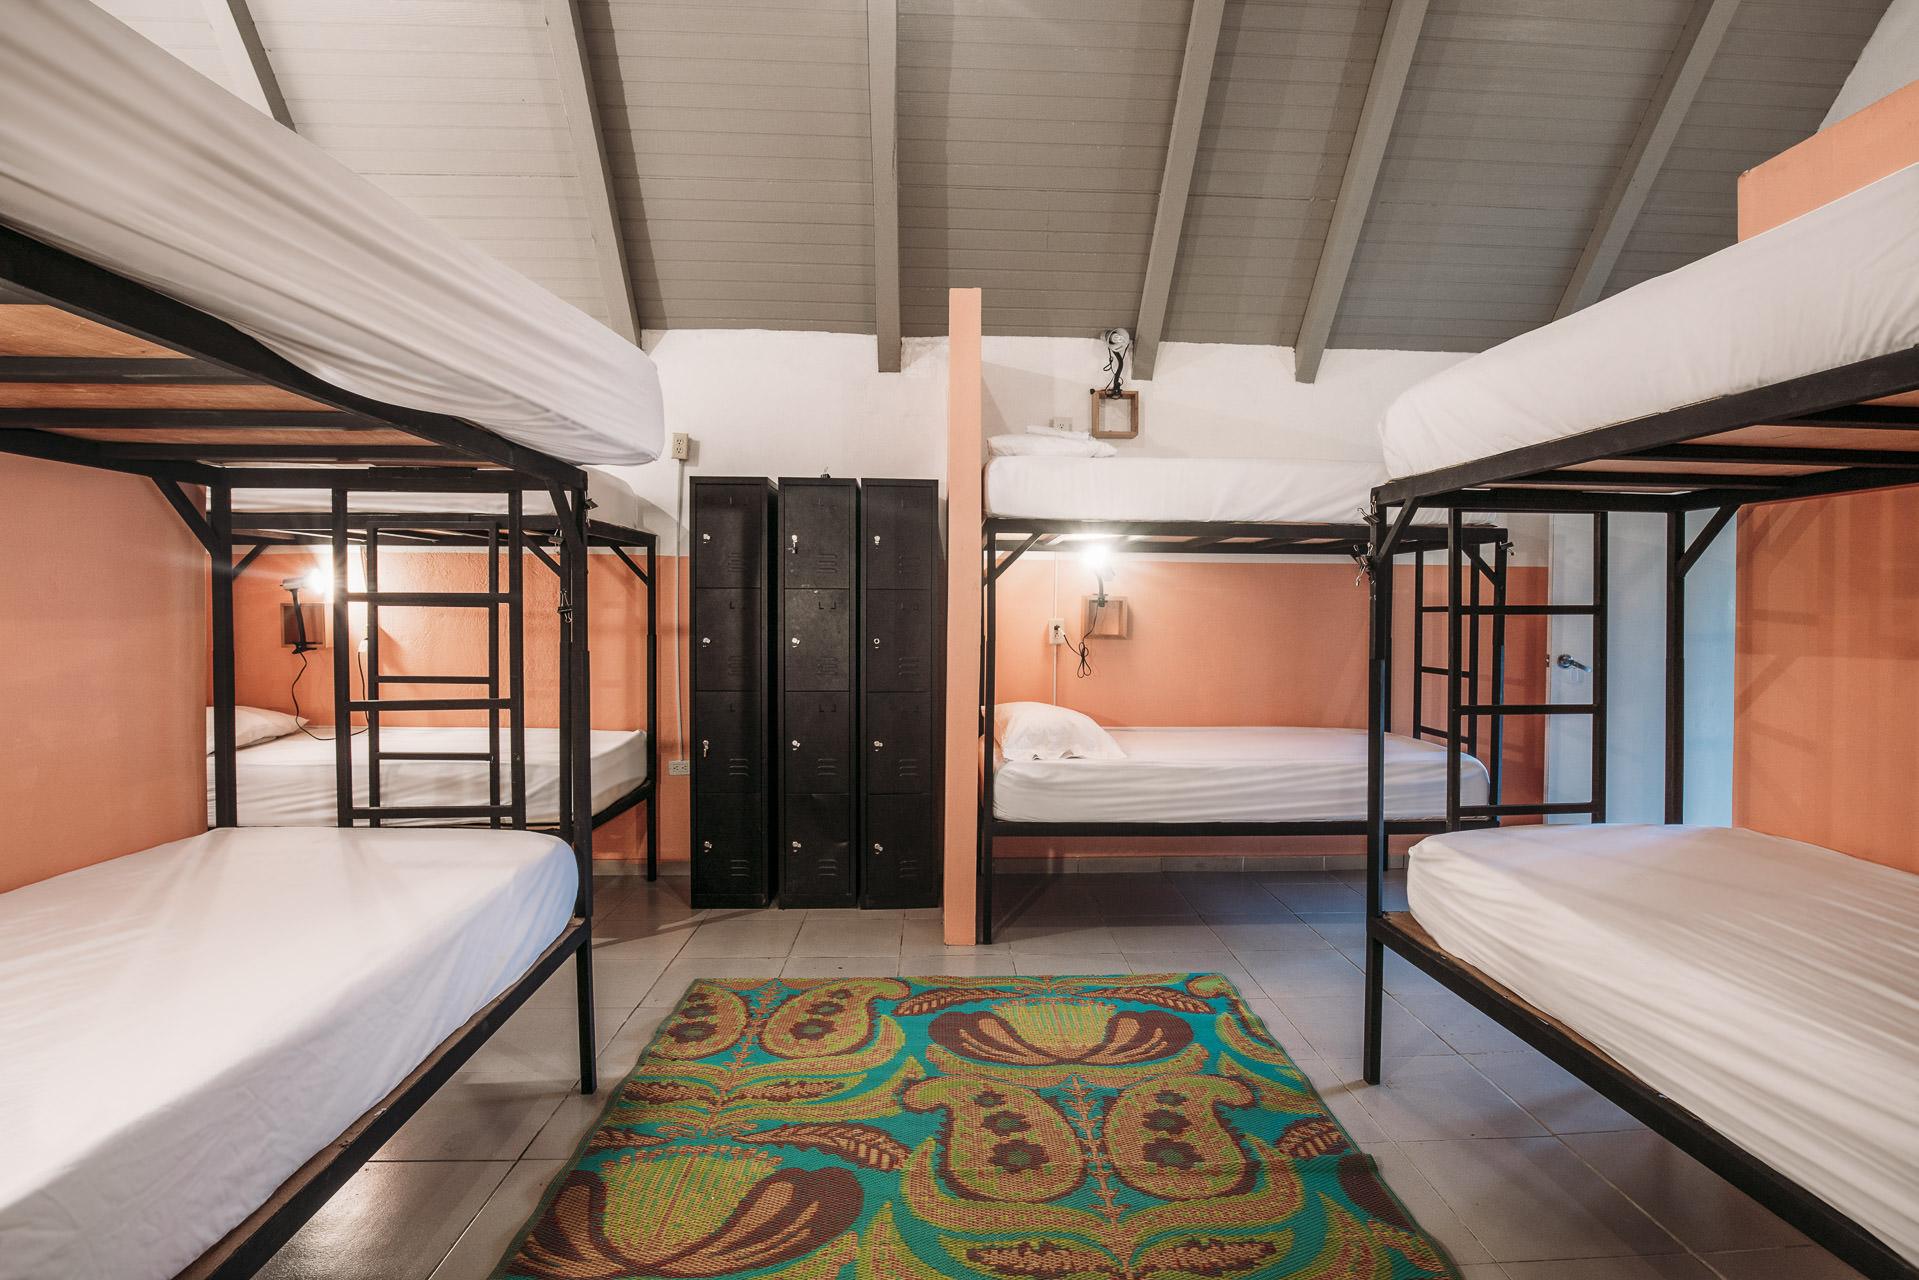 Room_Big Dorm_PVenao_006